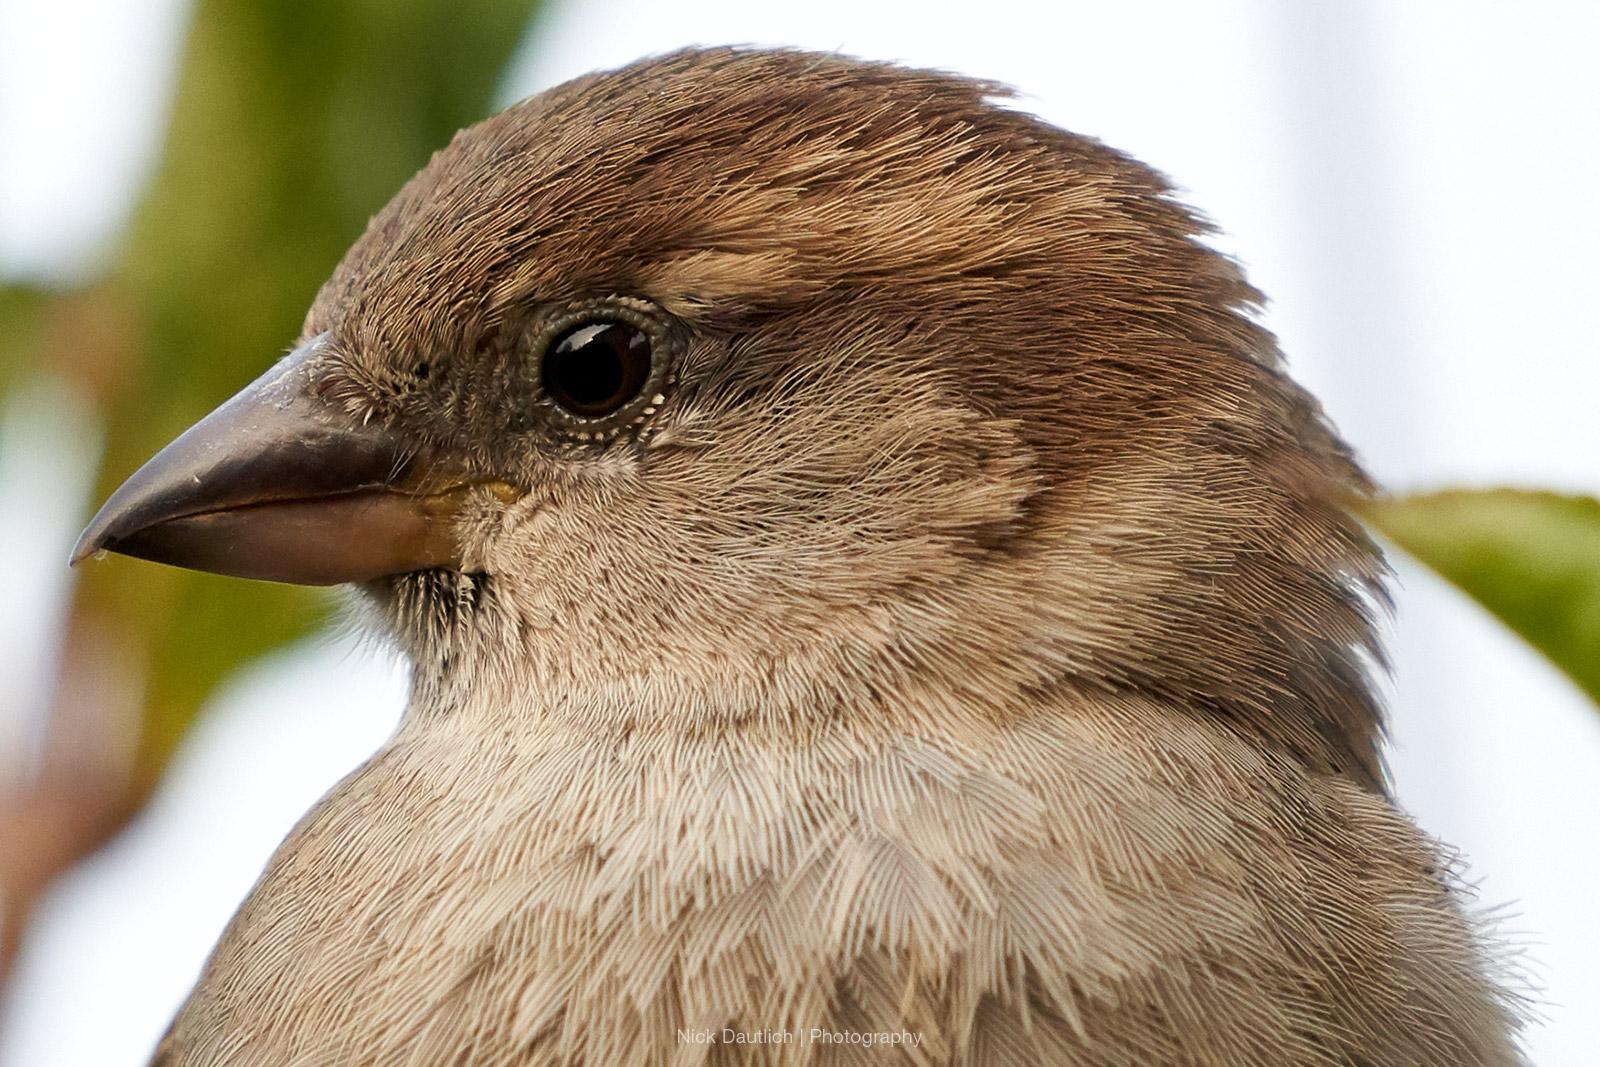 Close-up of bird details